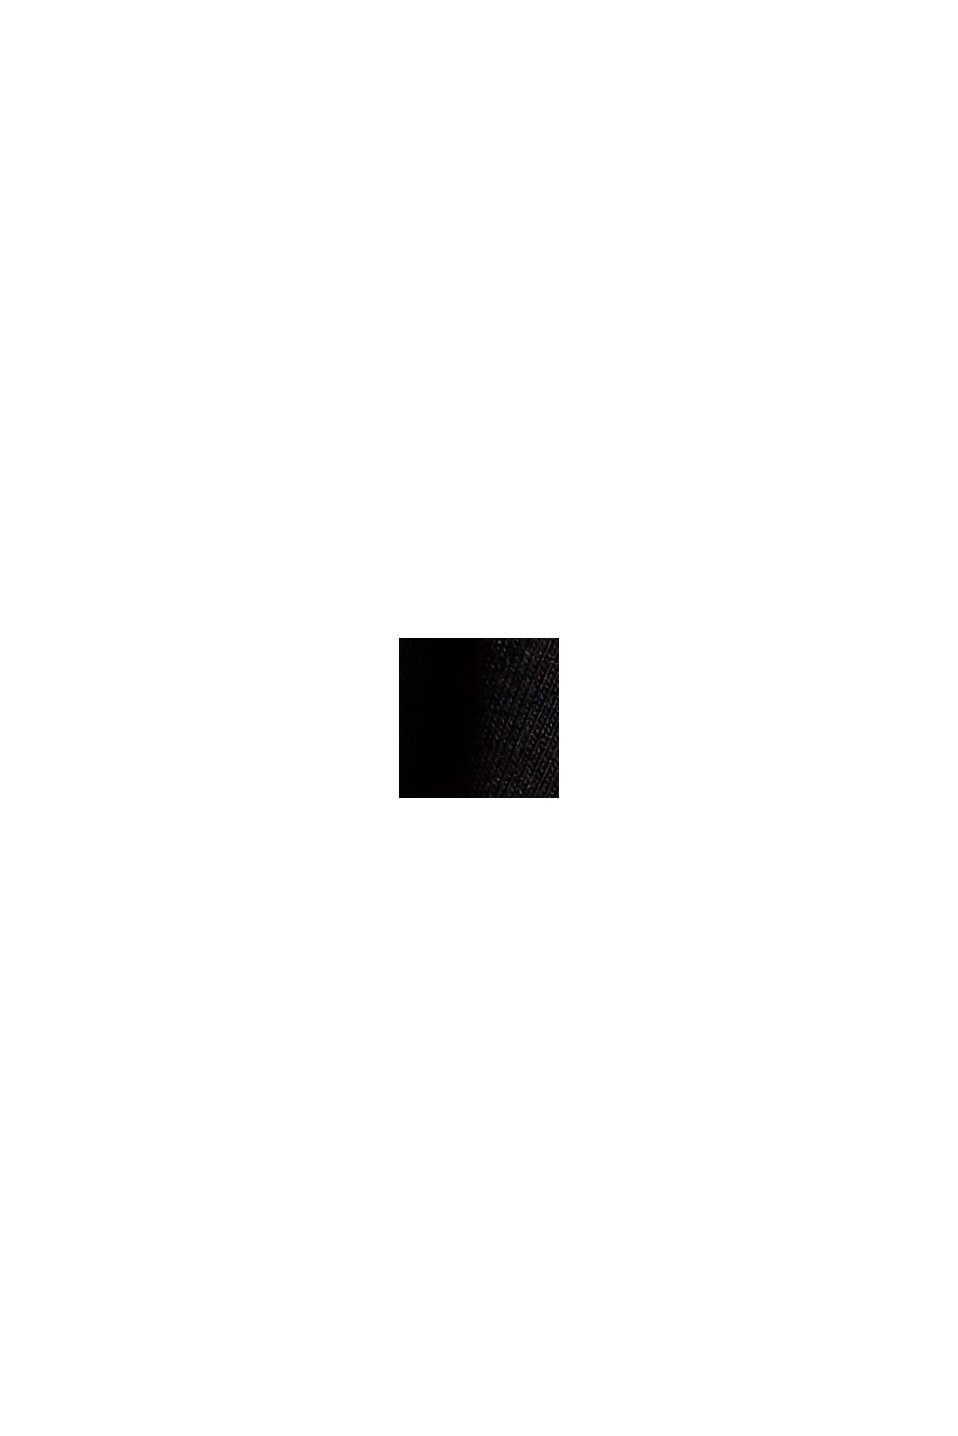 Jersey nachthemd van LENZING™ ECOVERO™, BLACK, swatch